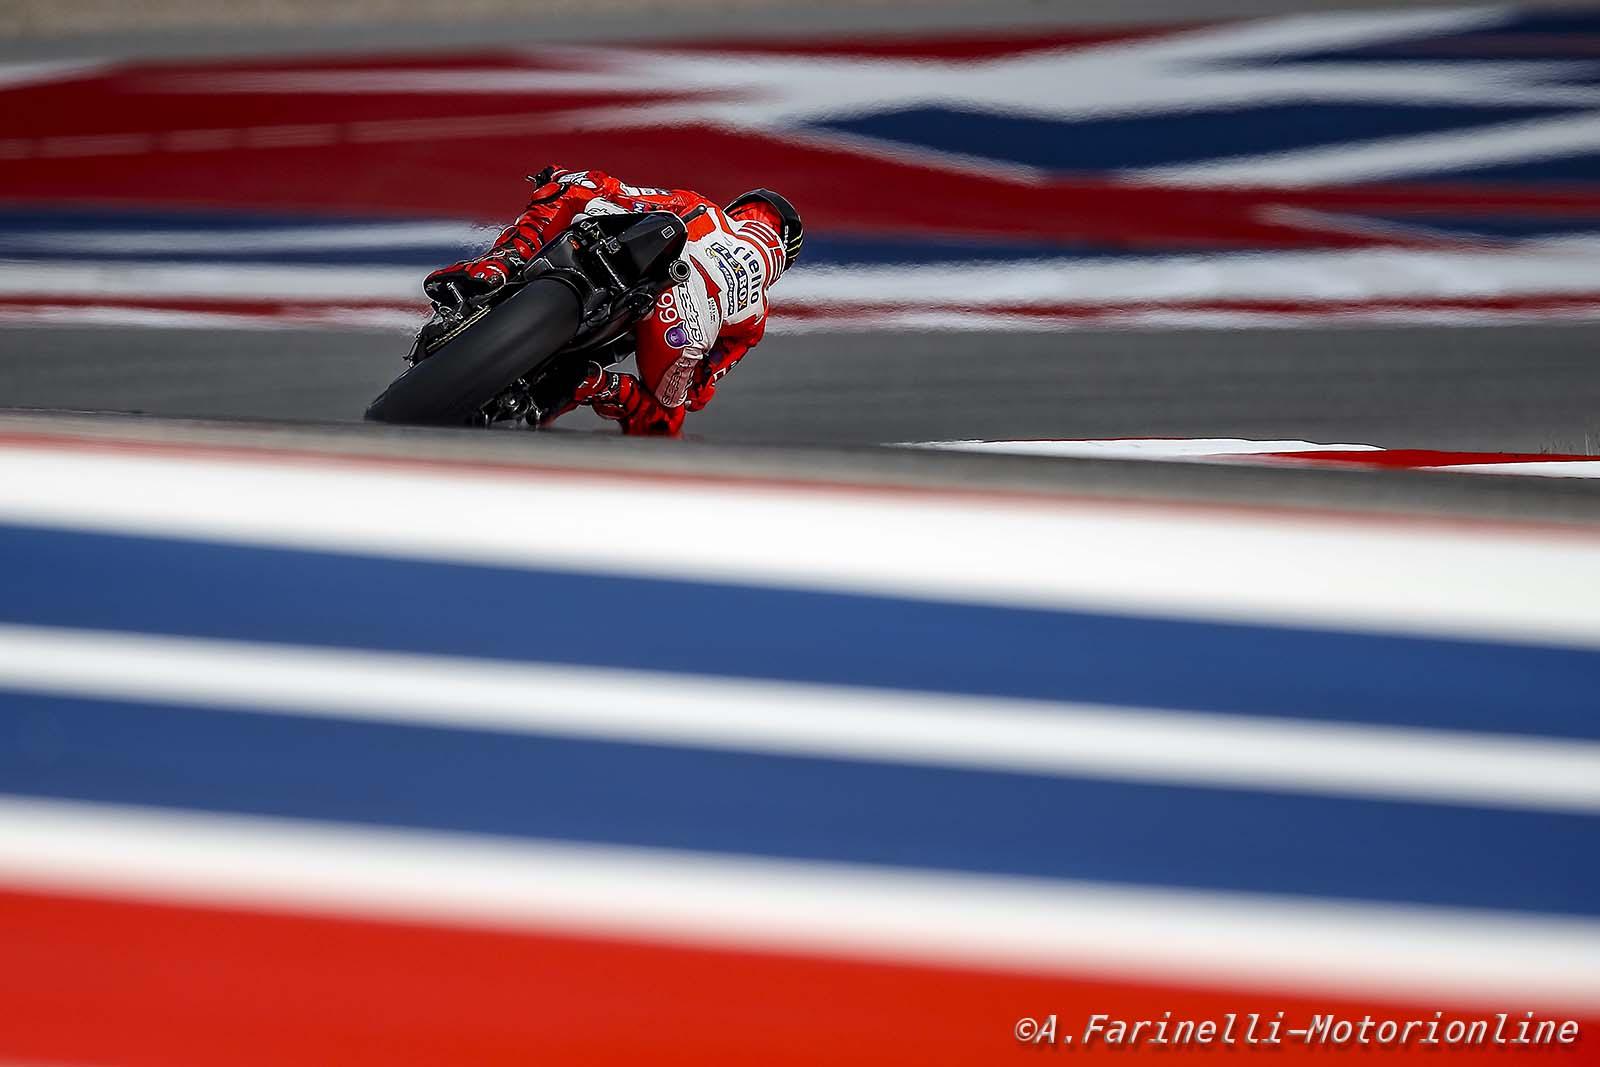 MotoGP Austin 2017Day_2 Foto MotoGP alta risoluzione 10 di 54